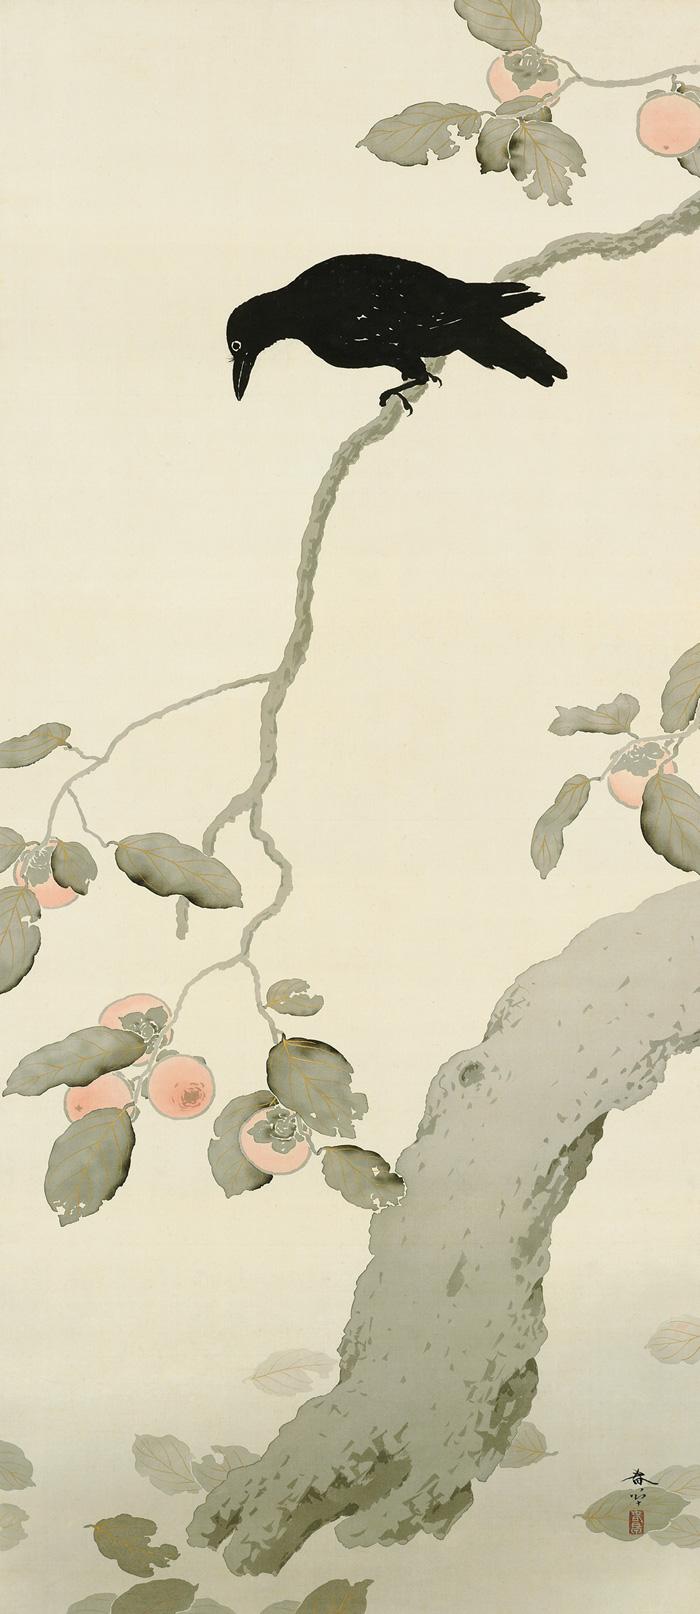 菱田春草 (1874-1911)《柿に烏》明治43(1910)年